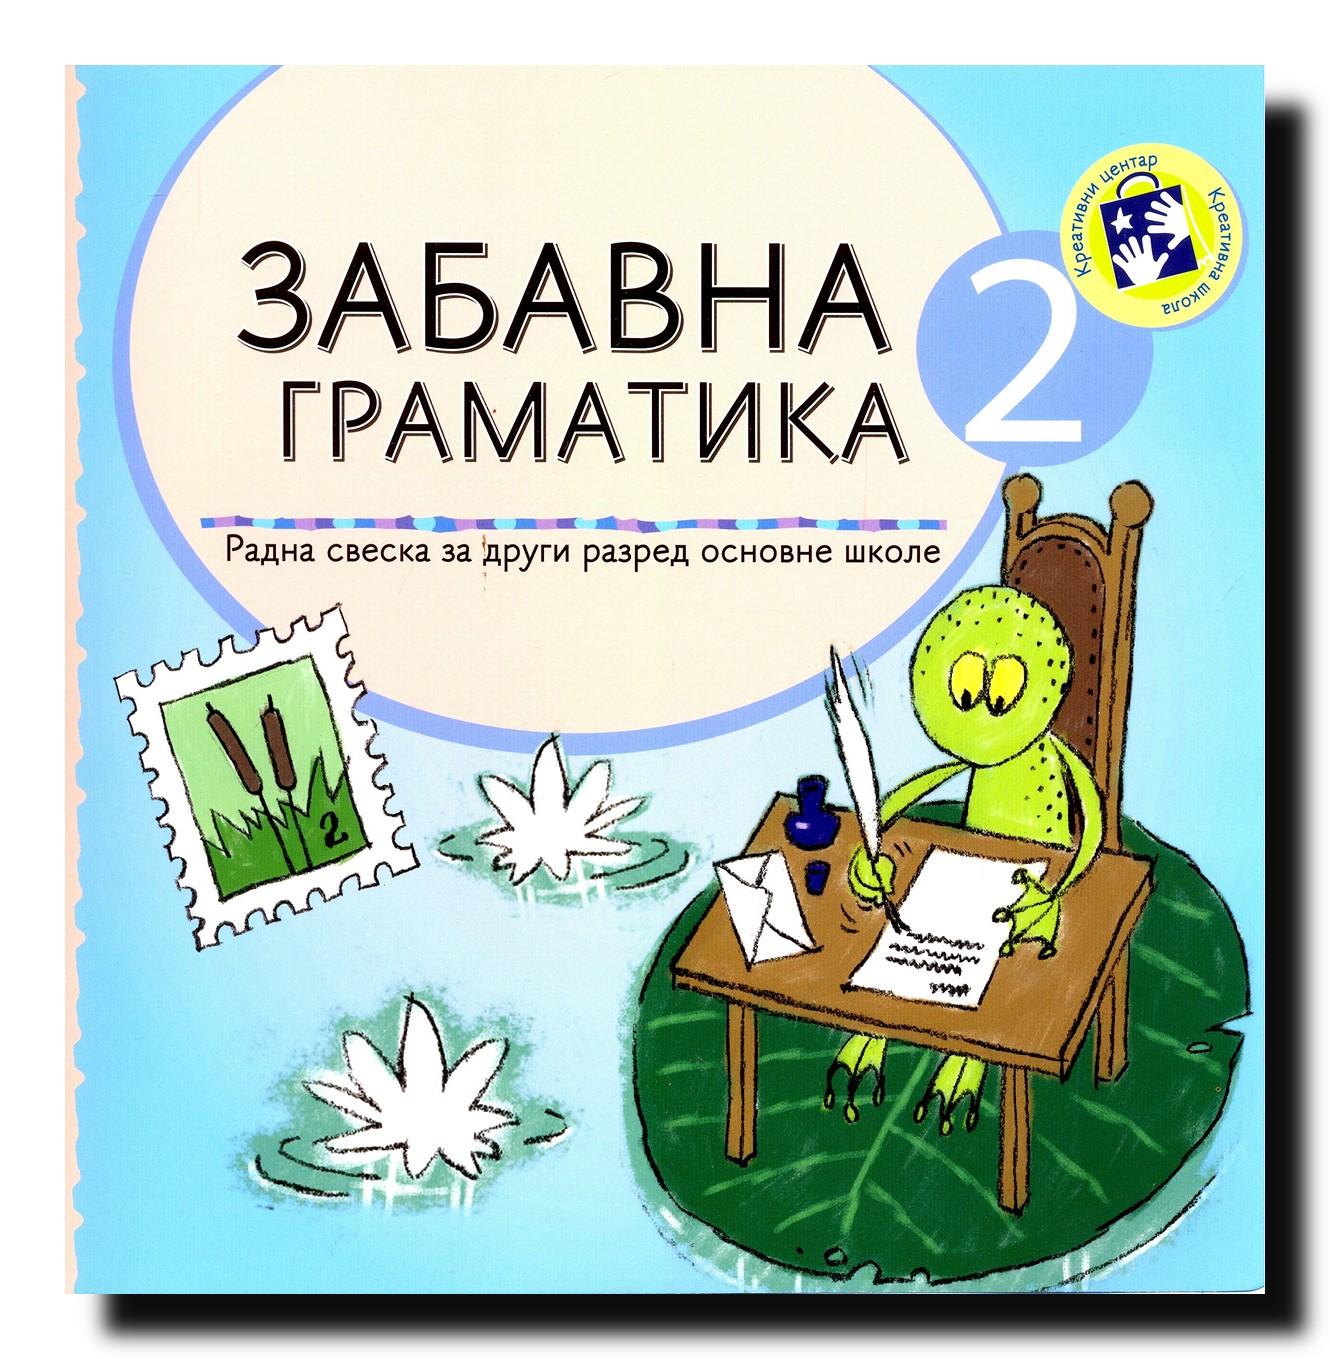 Zabavna gramatika 2 : radna sveska za drugi razred osnovne škole